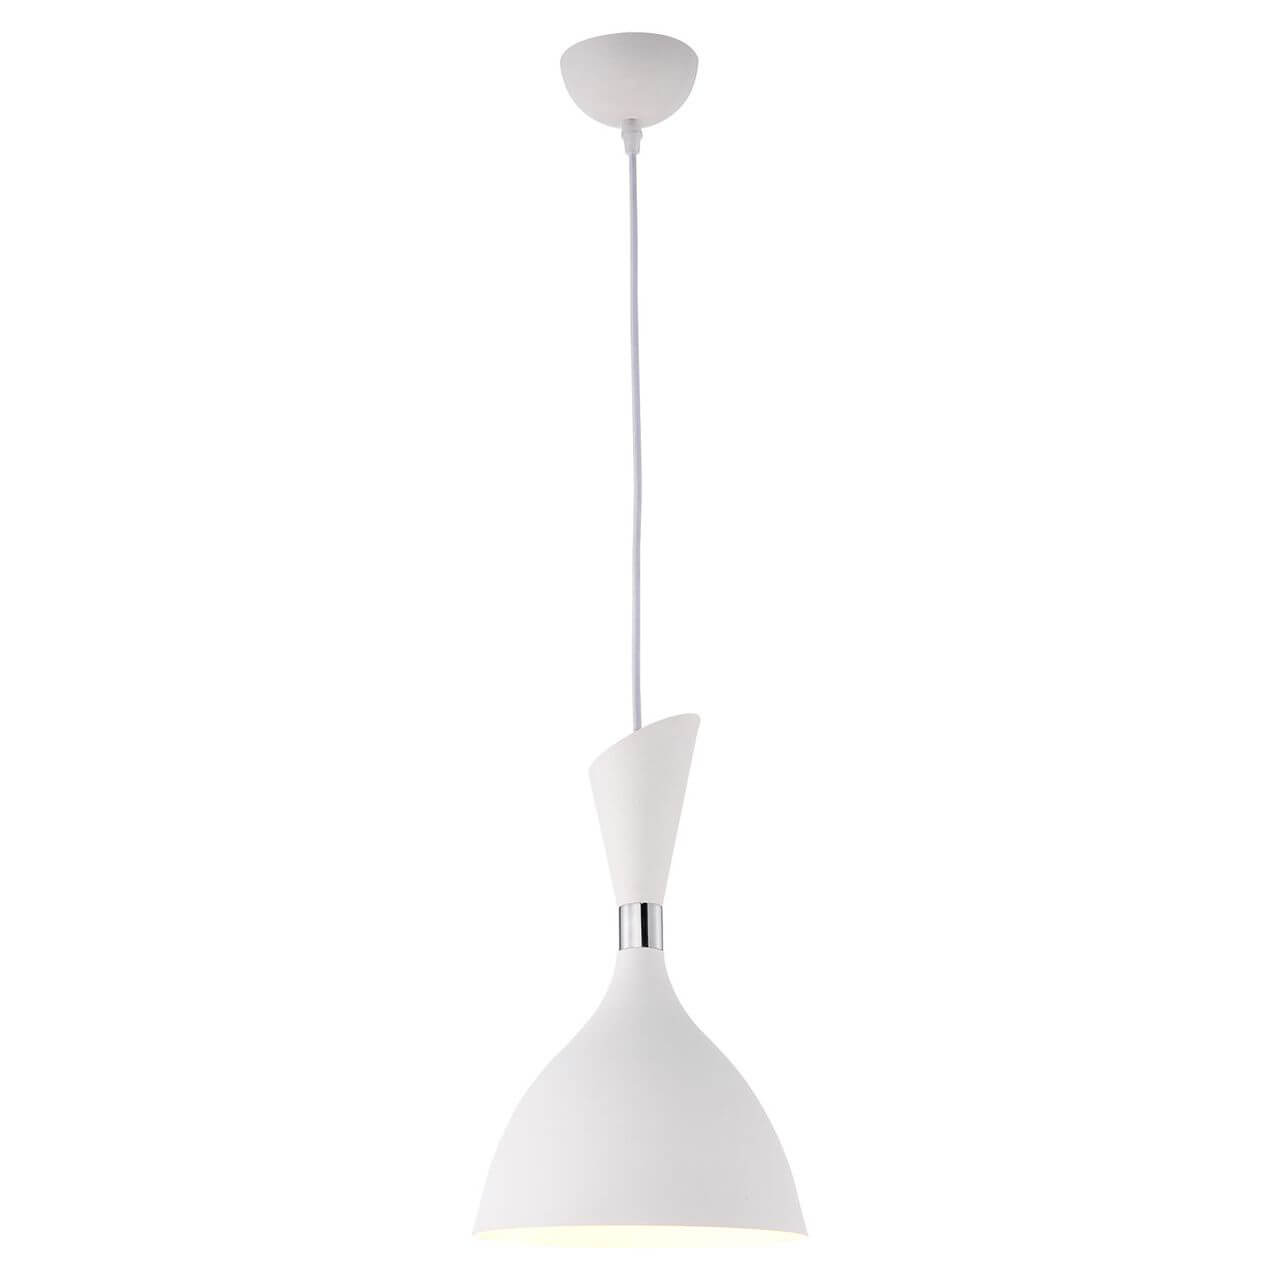 Светильник Lussole GRLSP-8151 Marion светильник lussole grlsp 8148 marion